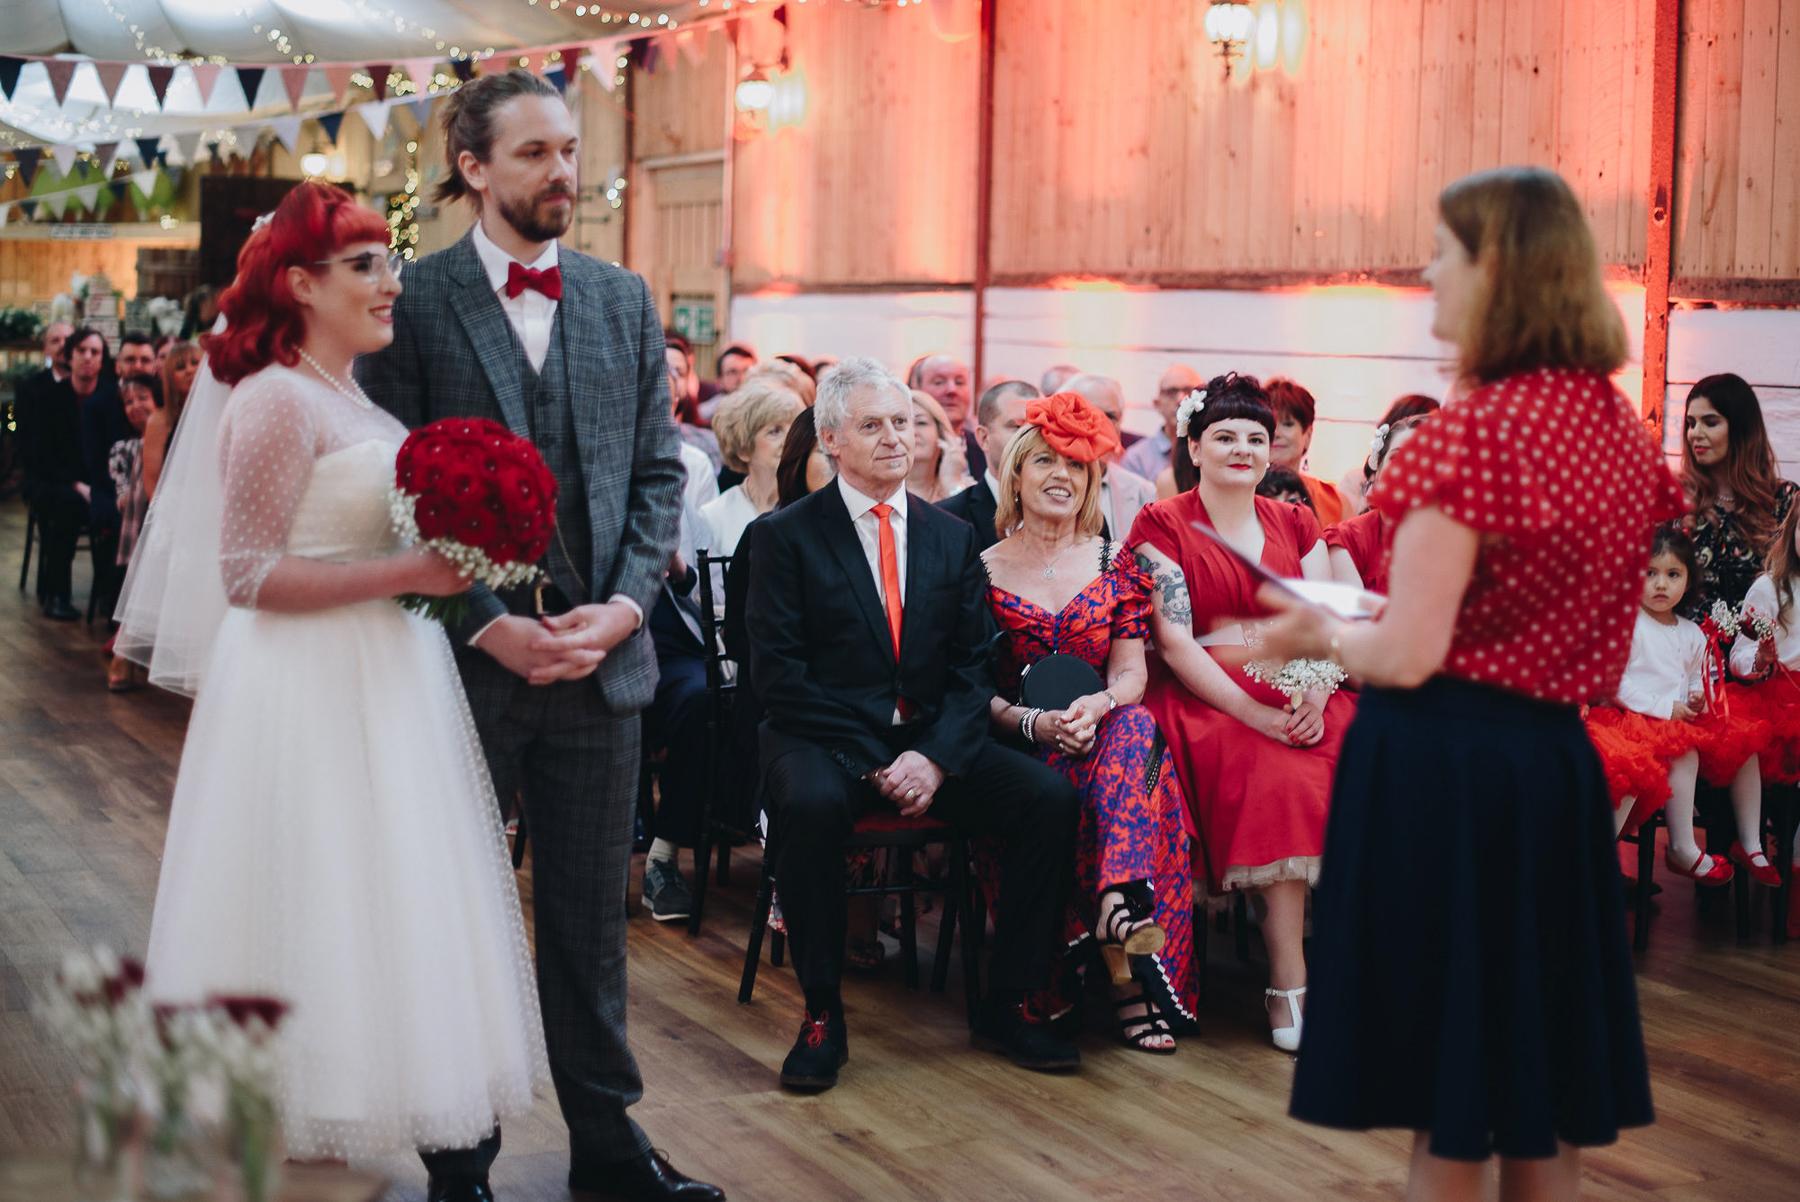 Wellbeing_Farm_Wedding_Photography_The_Pin-Up_Bride_Lara_Shaun-52.jpg